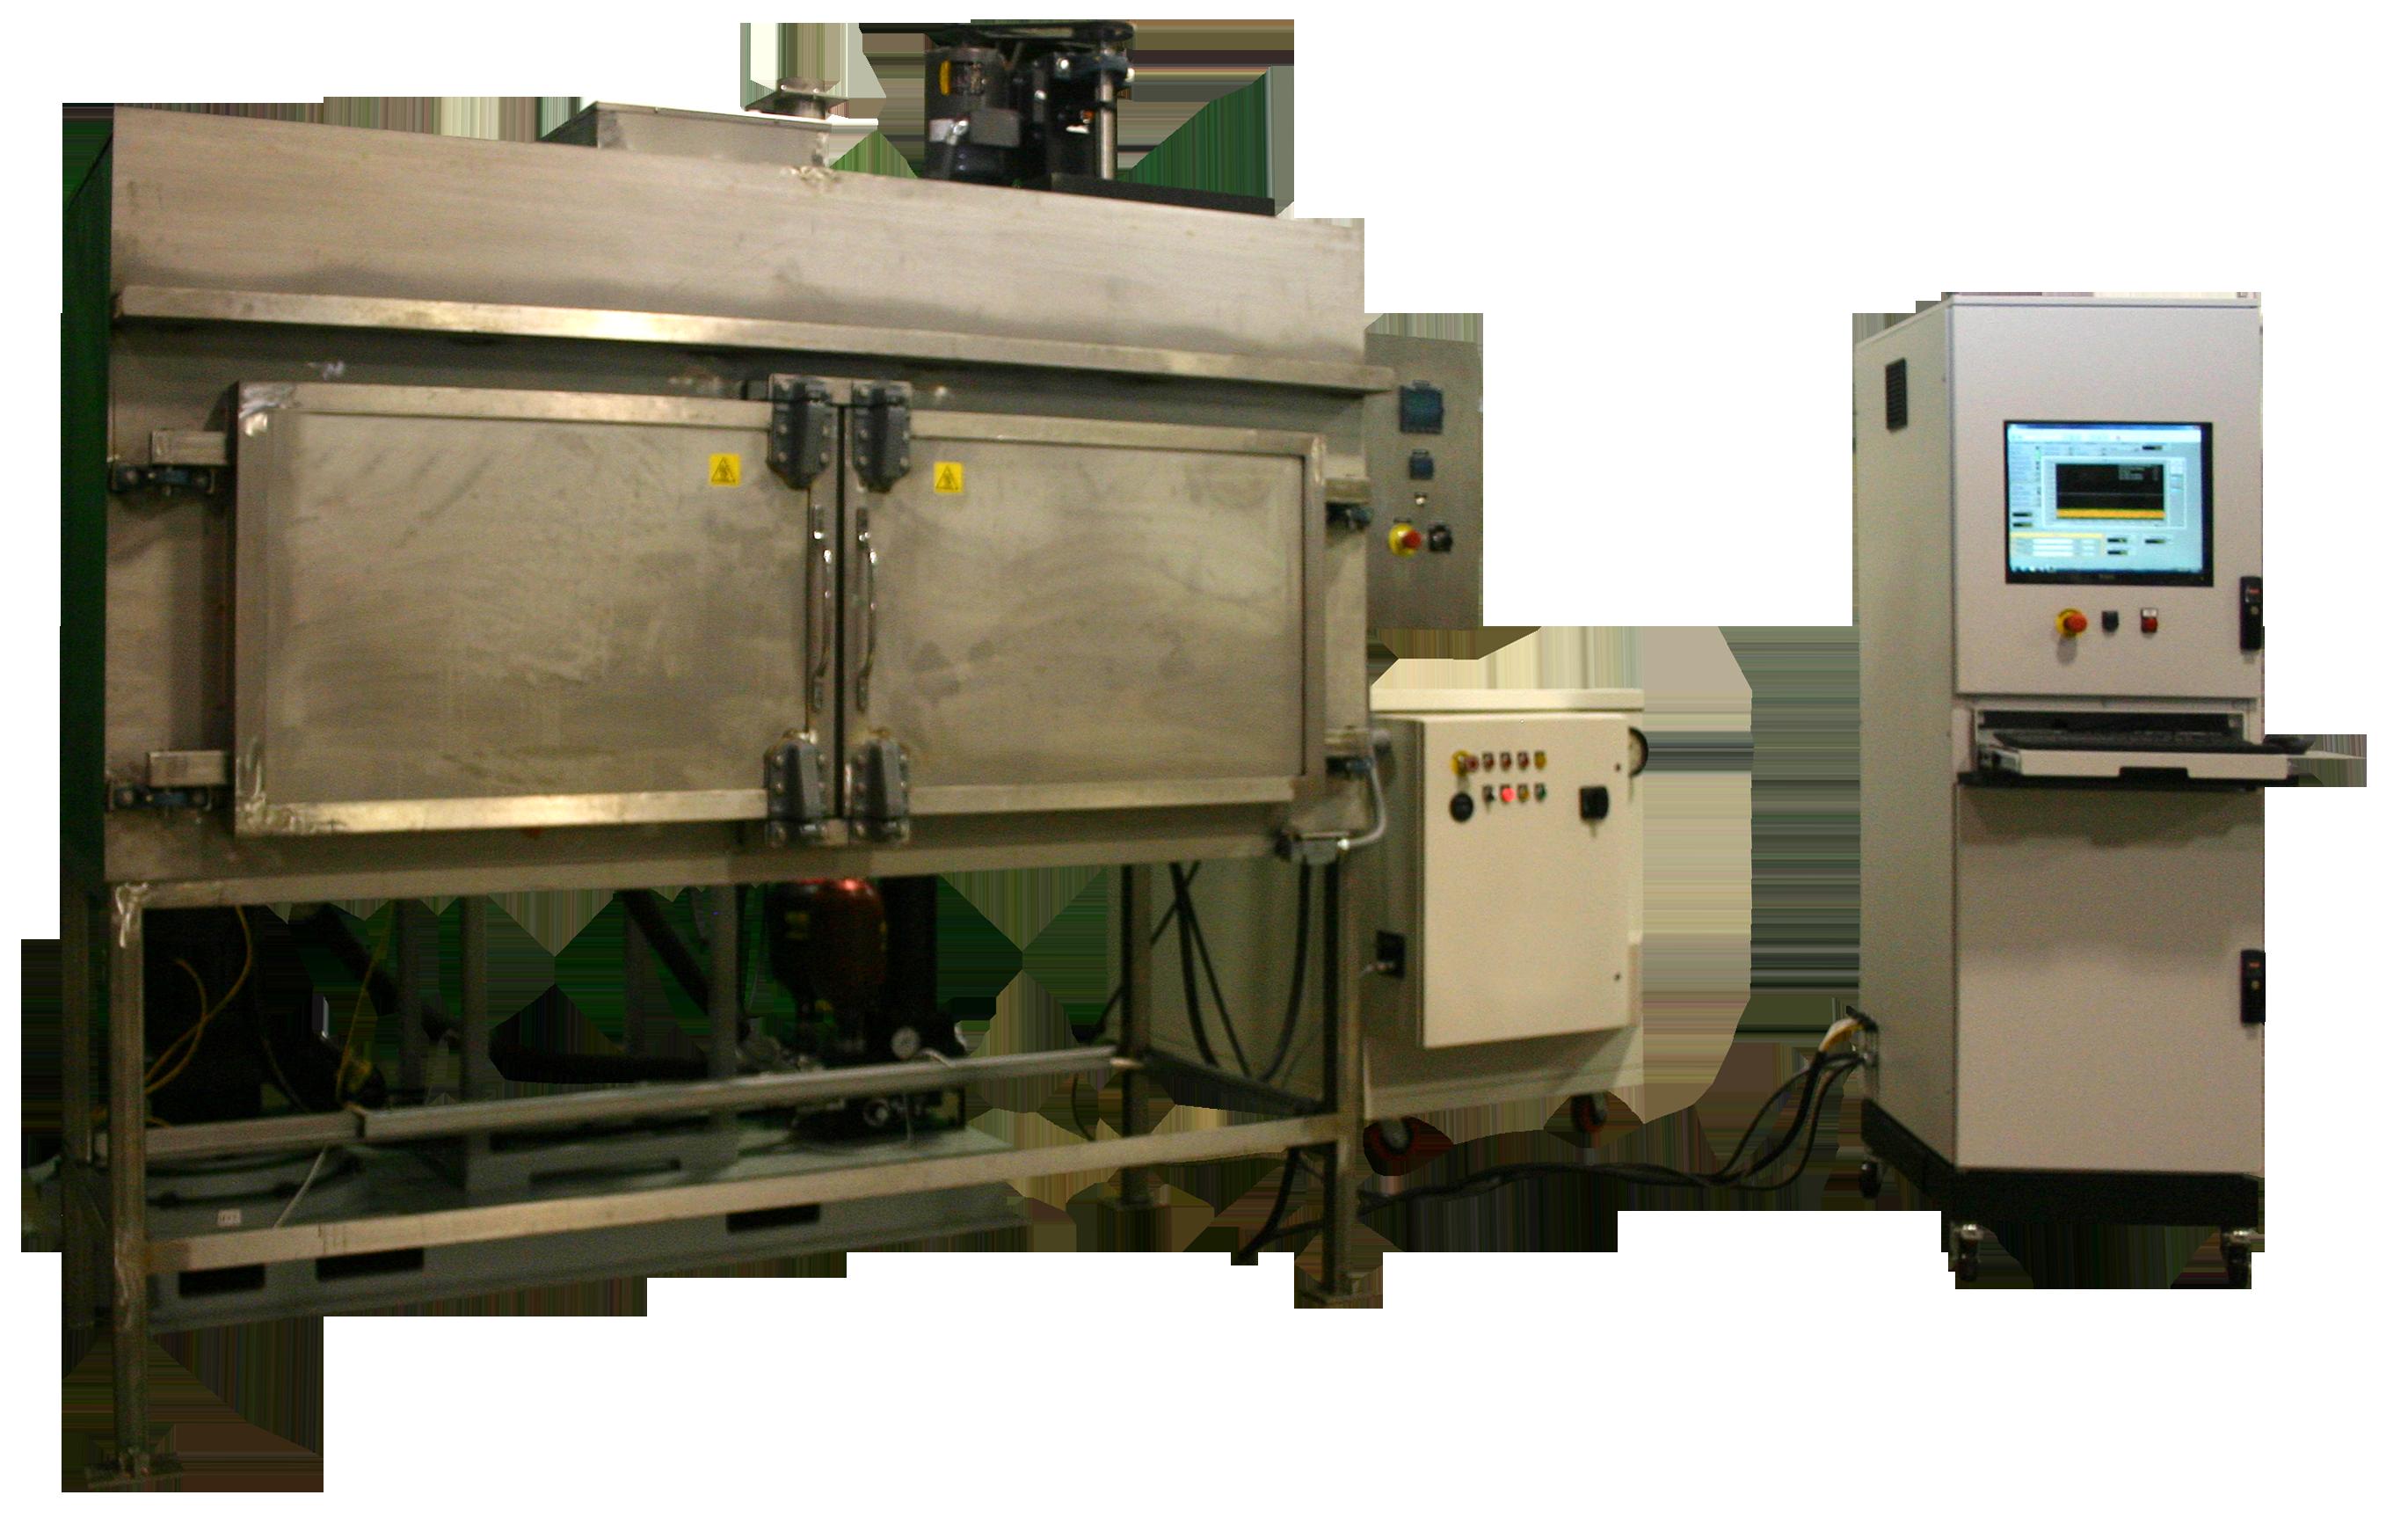 Impulse test stand